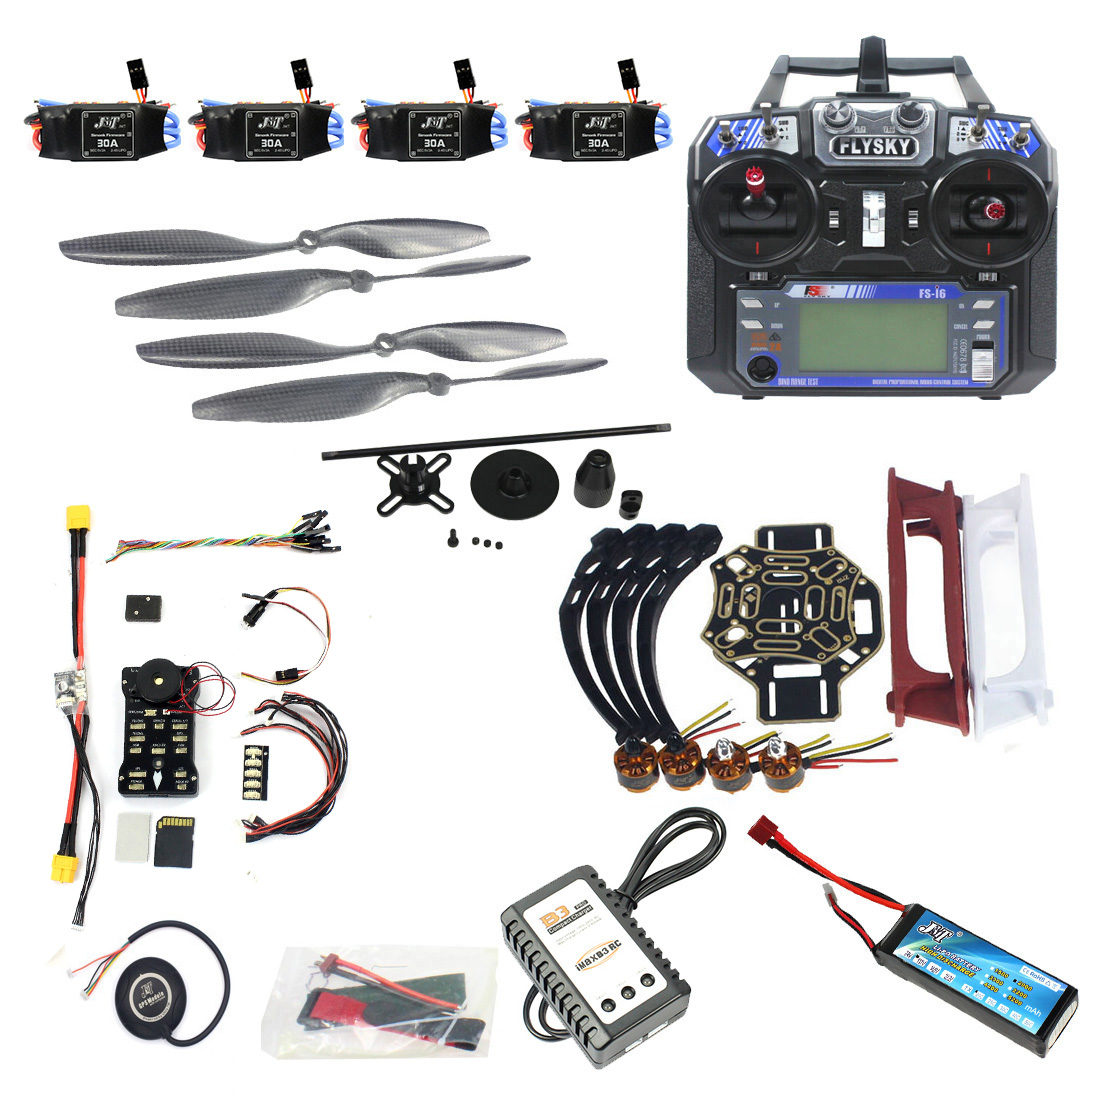 DIY FPV RC Drone Quadcopter 4 axle Aircraft Kit 450 Frame PXI PX4 Flight Control 920KV